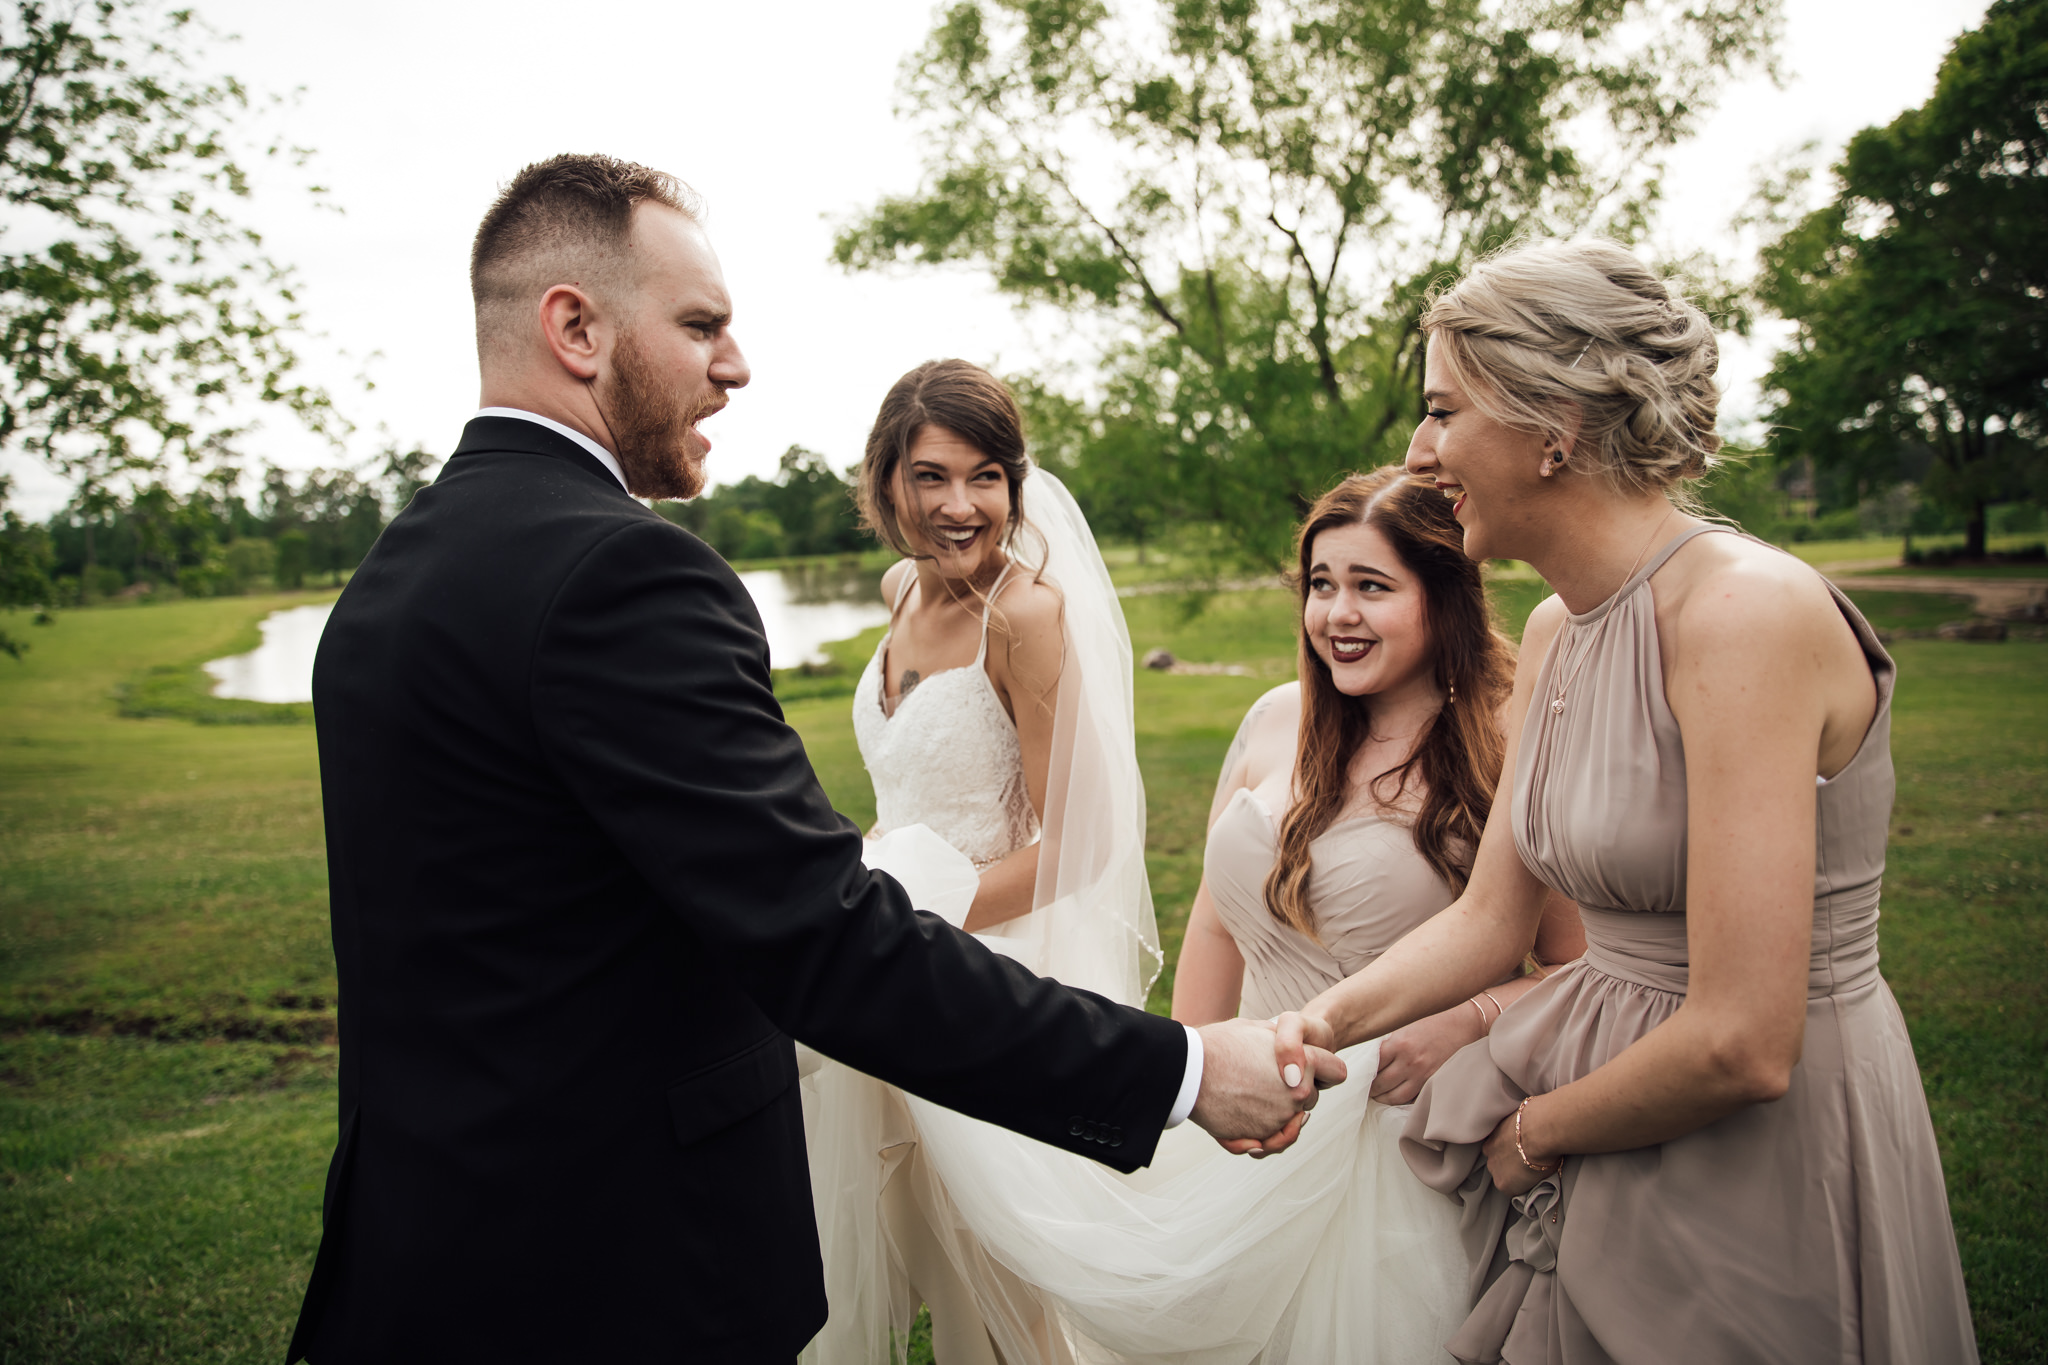 phantom-canyon-brewery-colorado-springs-wedding-photographer-326.jpg